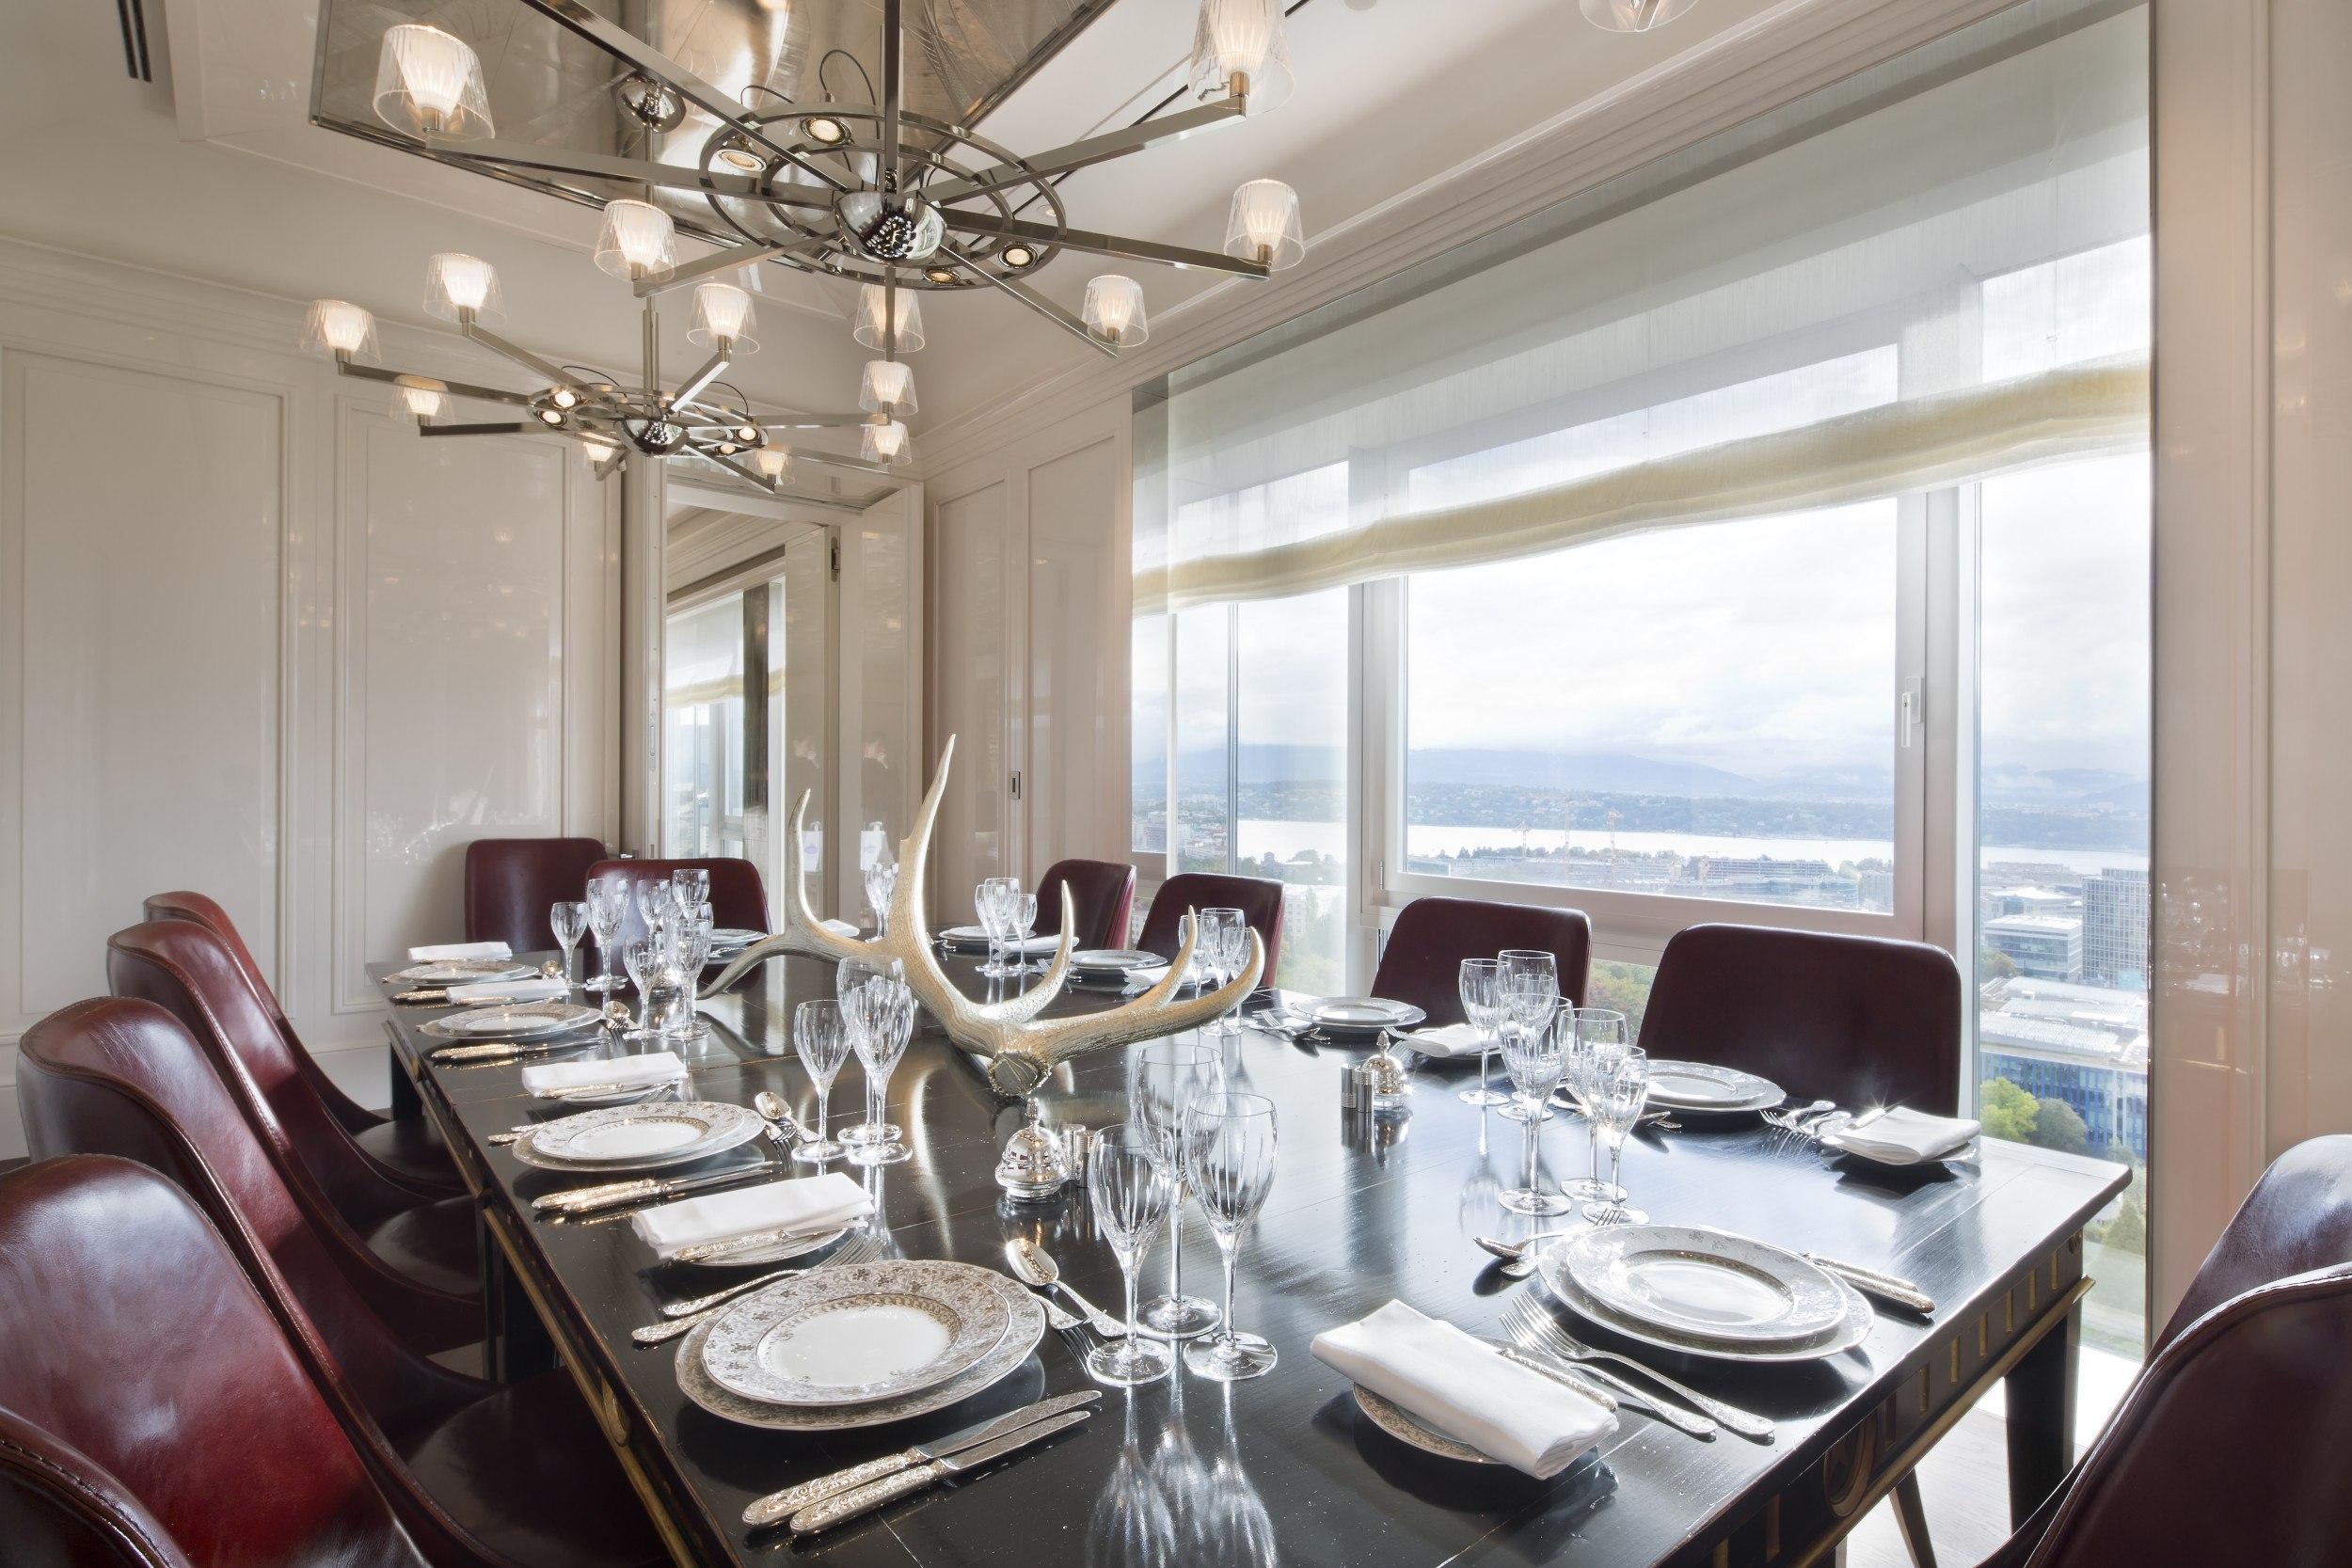 intercontinental-geneve-la-residence-table-manger